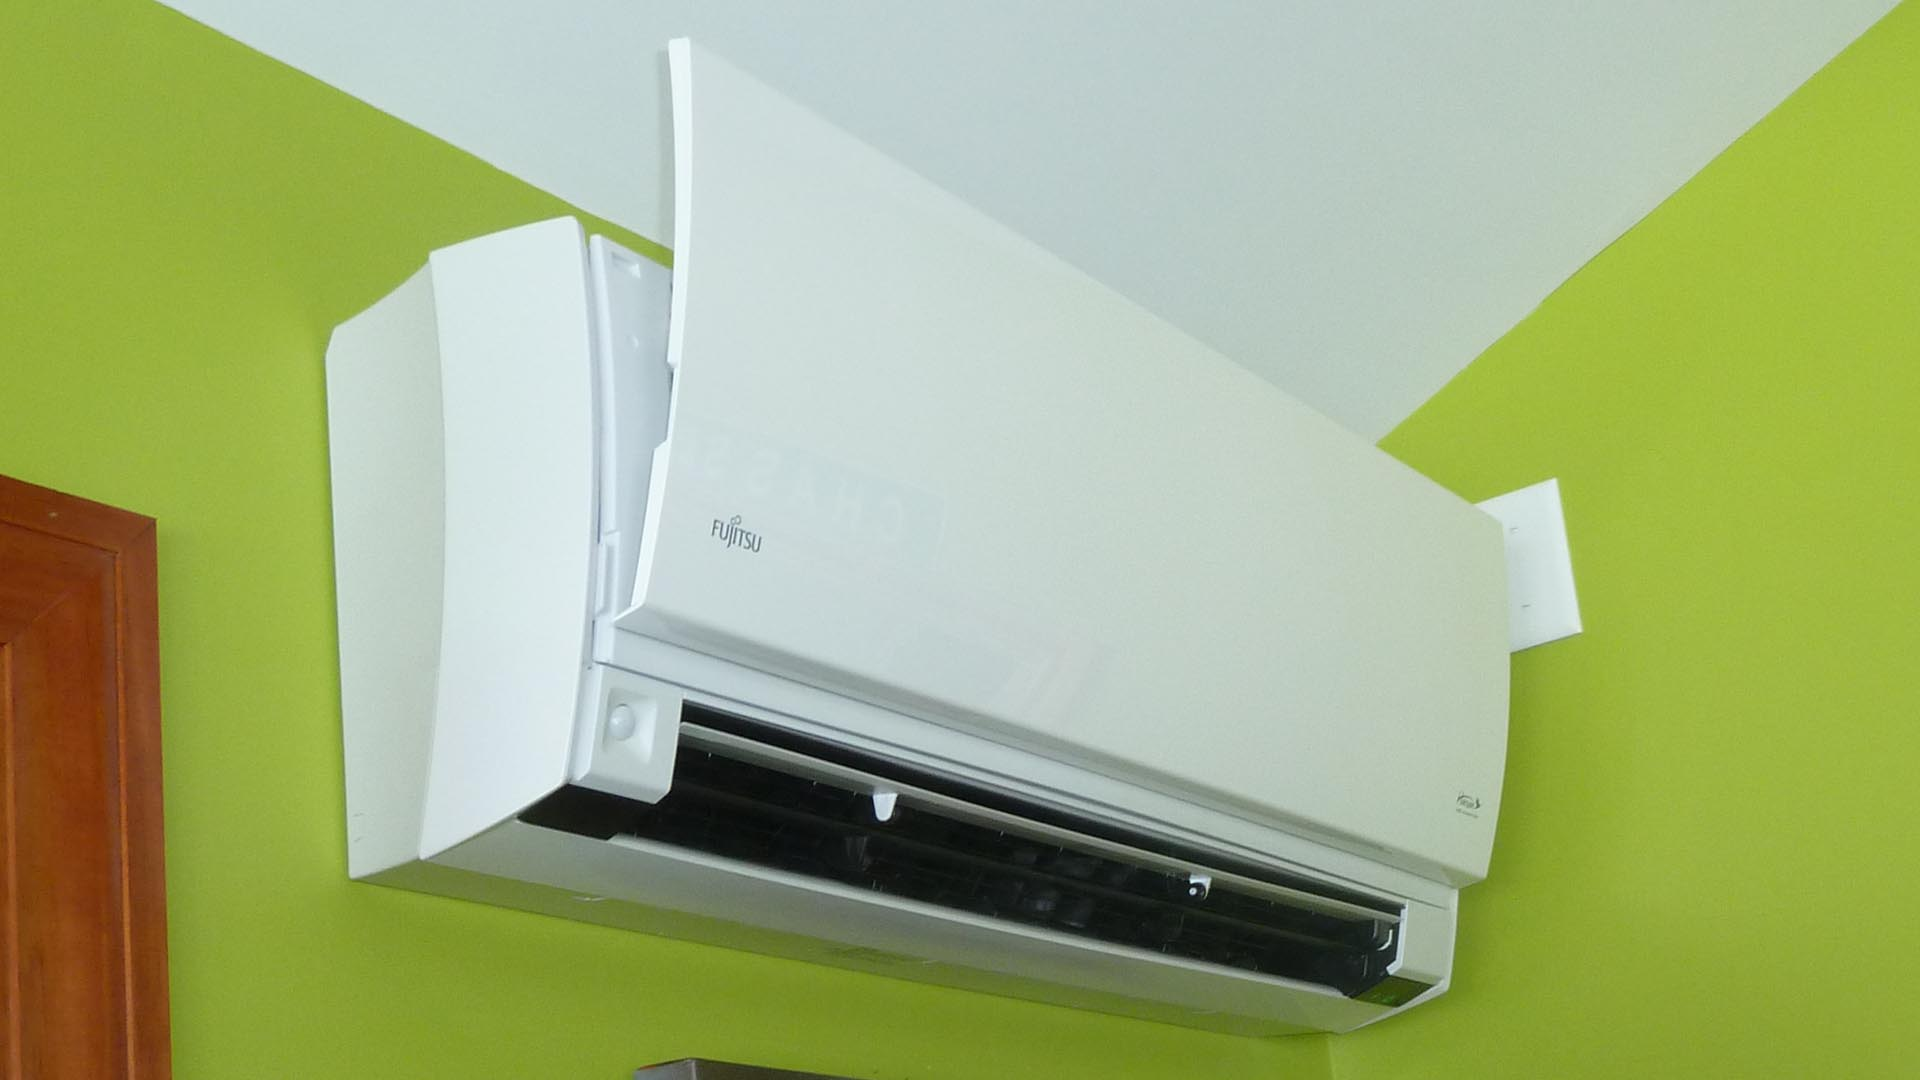 Quadomated 187 Fujitsu 15rls2 Heat Pump Installed My